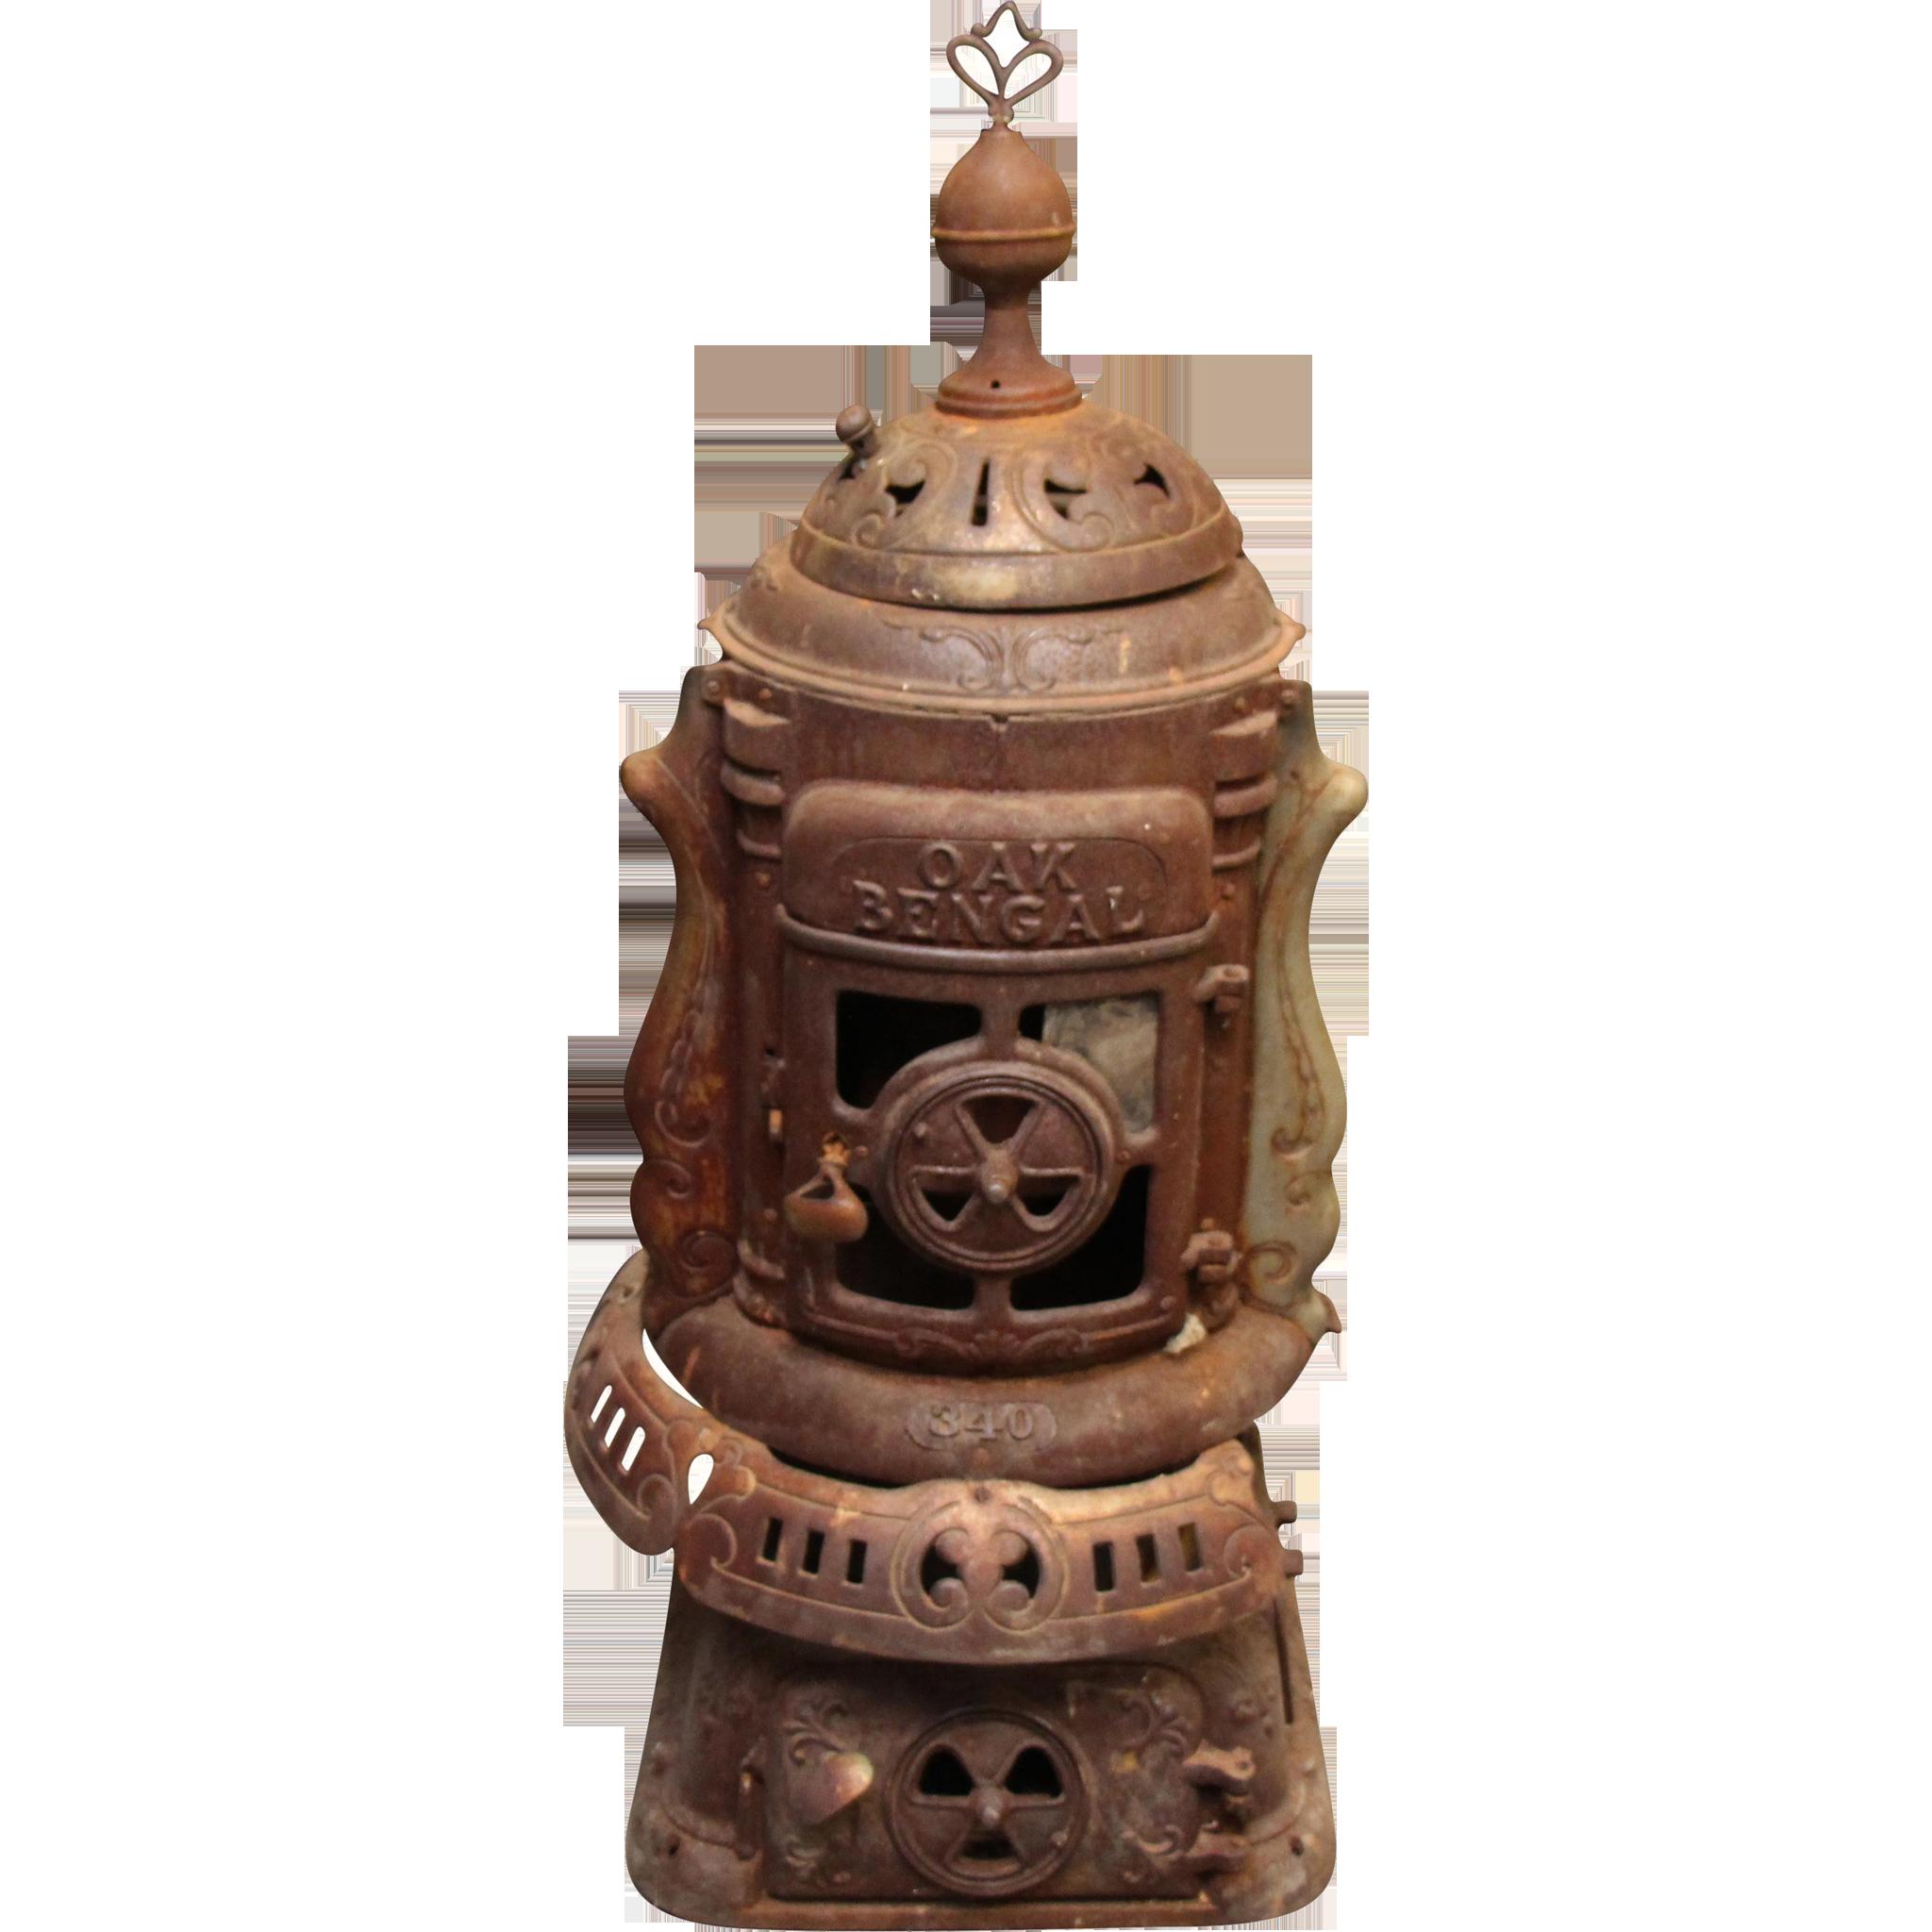 Ornate cast iron Oak Bengal antique stove